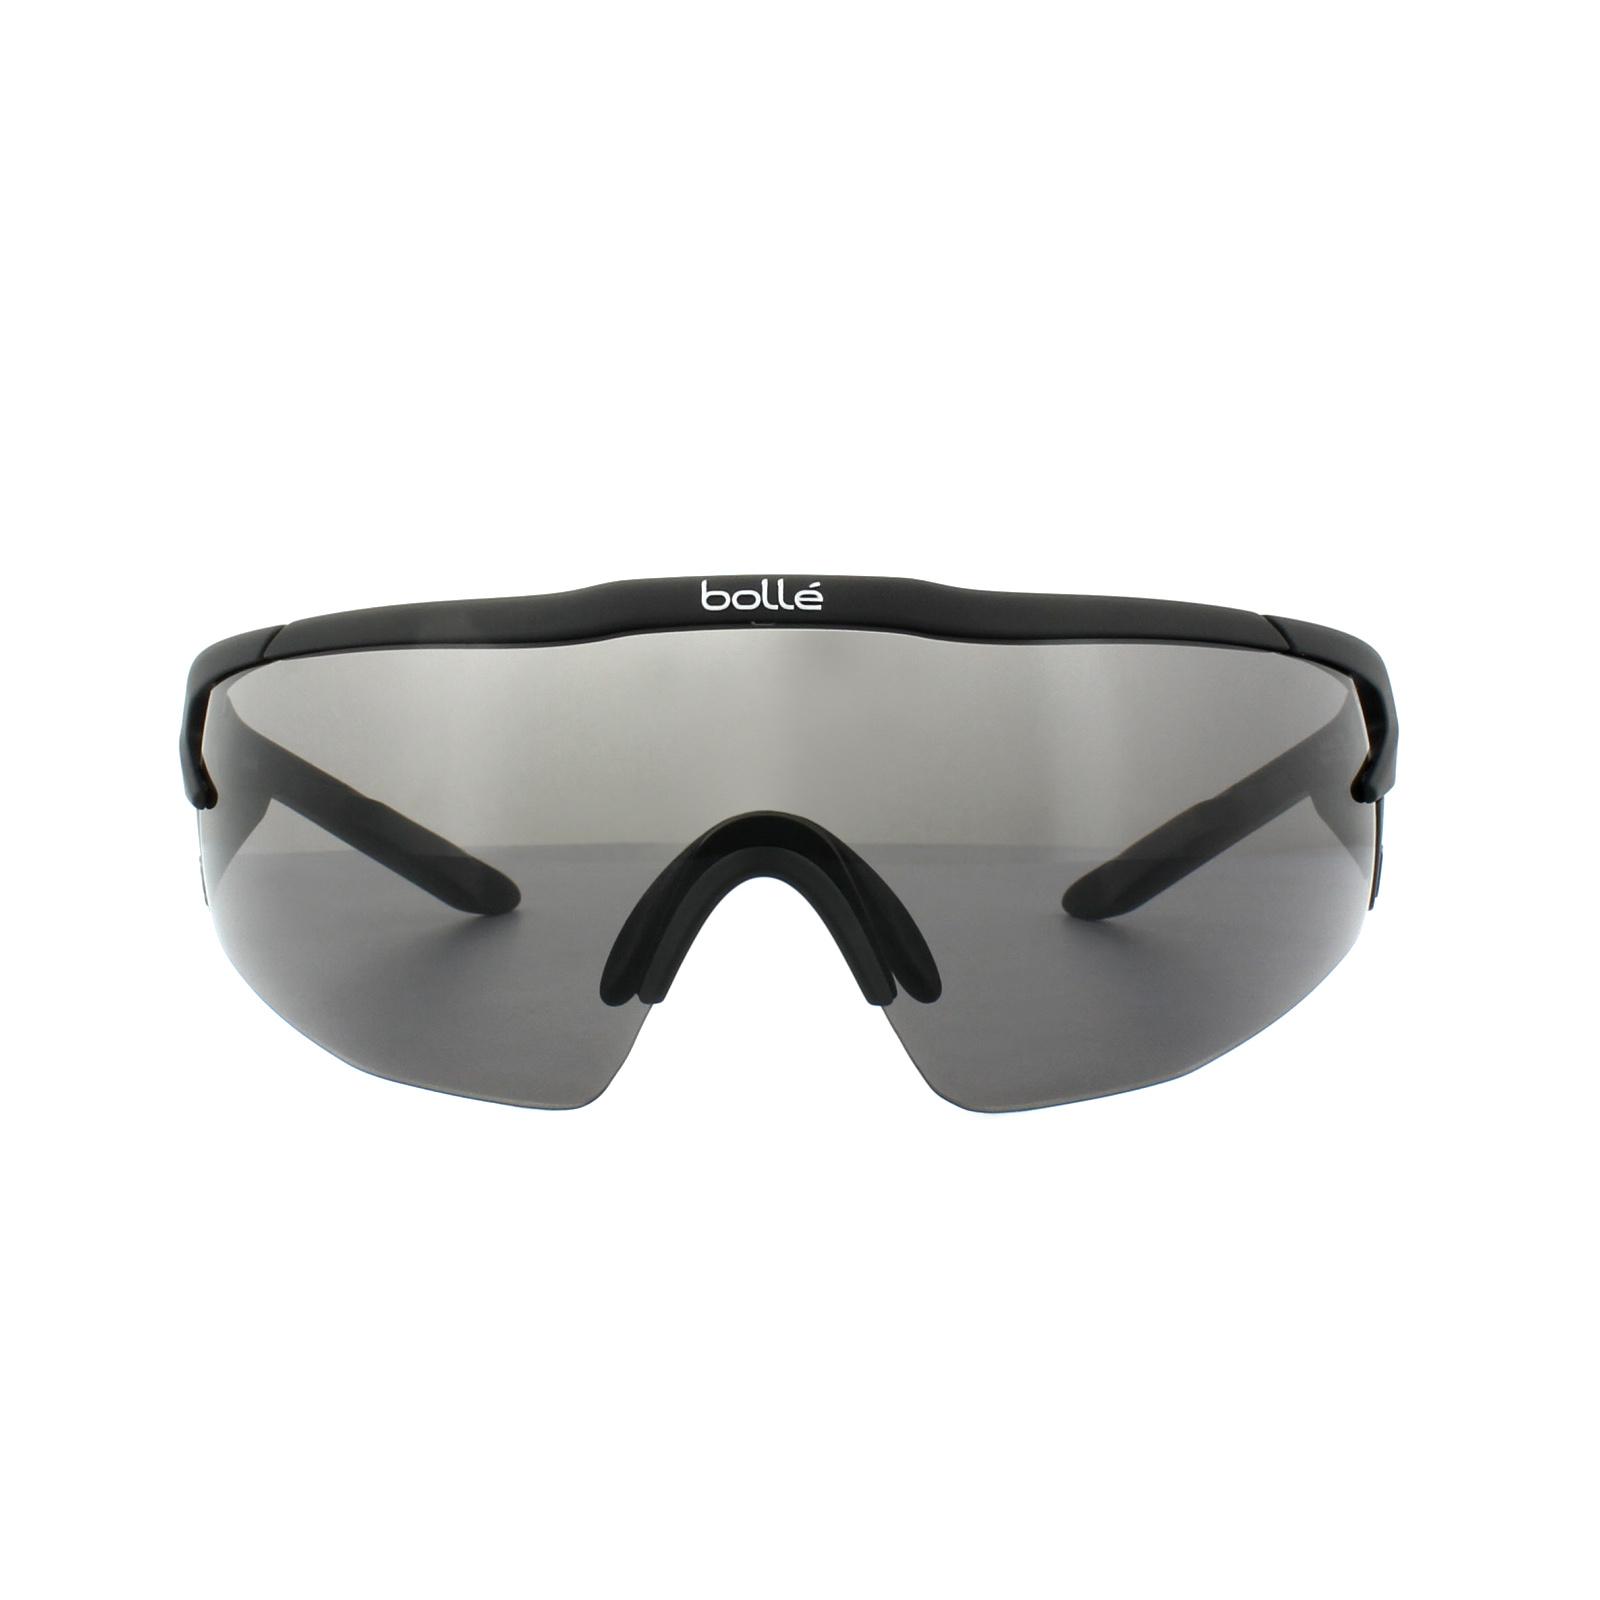 f80304d038 Bolle Aeromax Sunglasses Thumbnail 1 Bolle Aeromax Sunglasses Thumbnail 2  ...